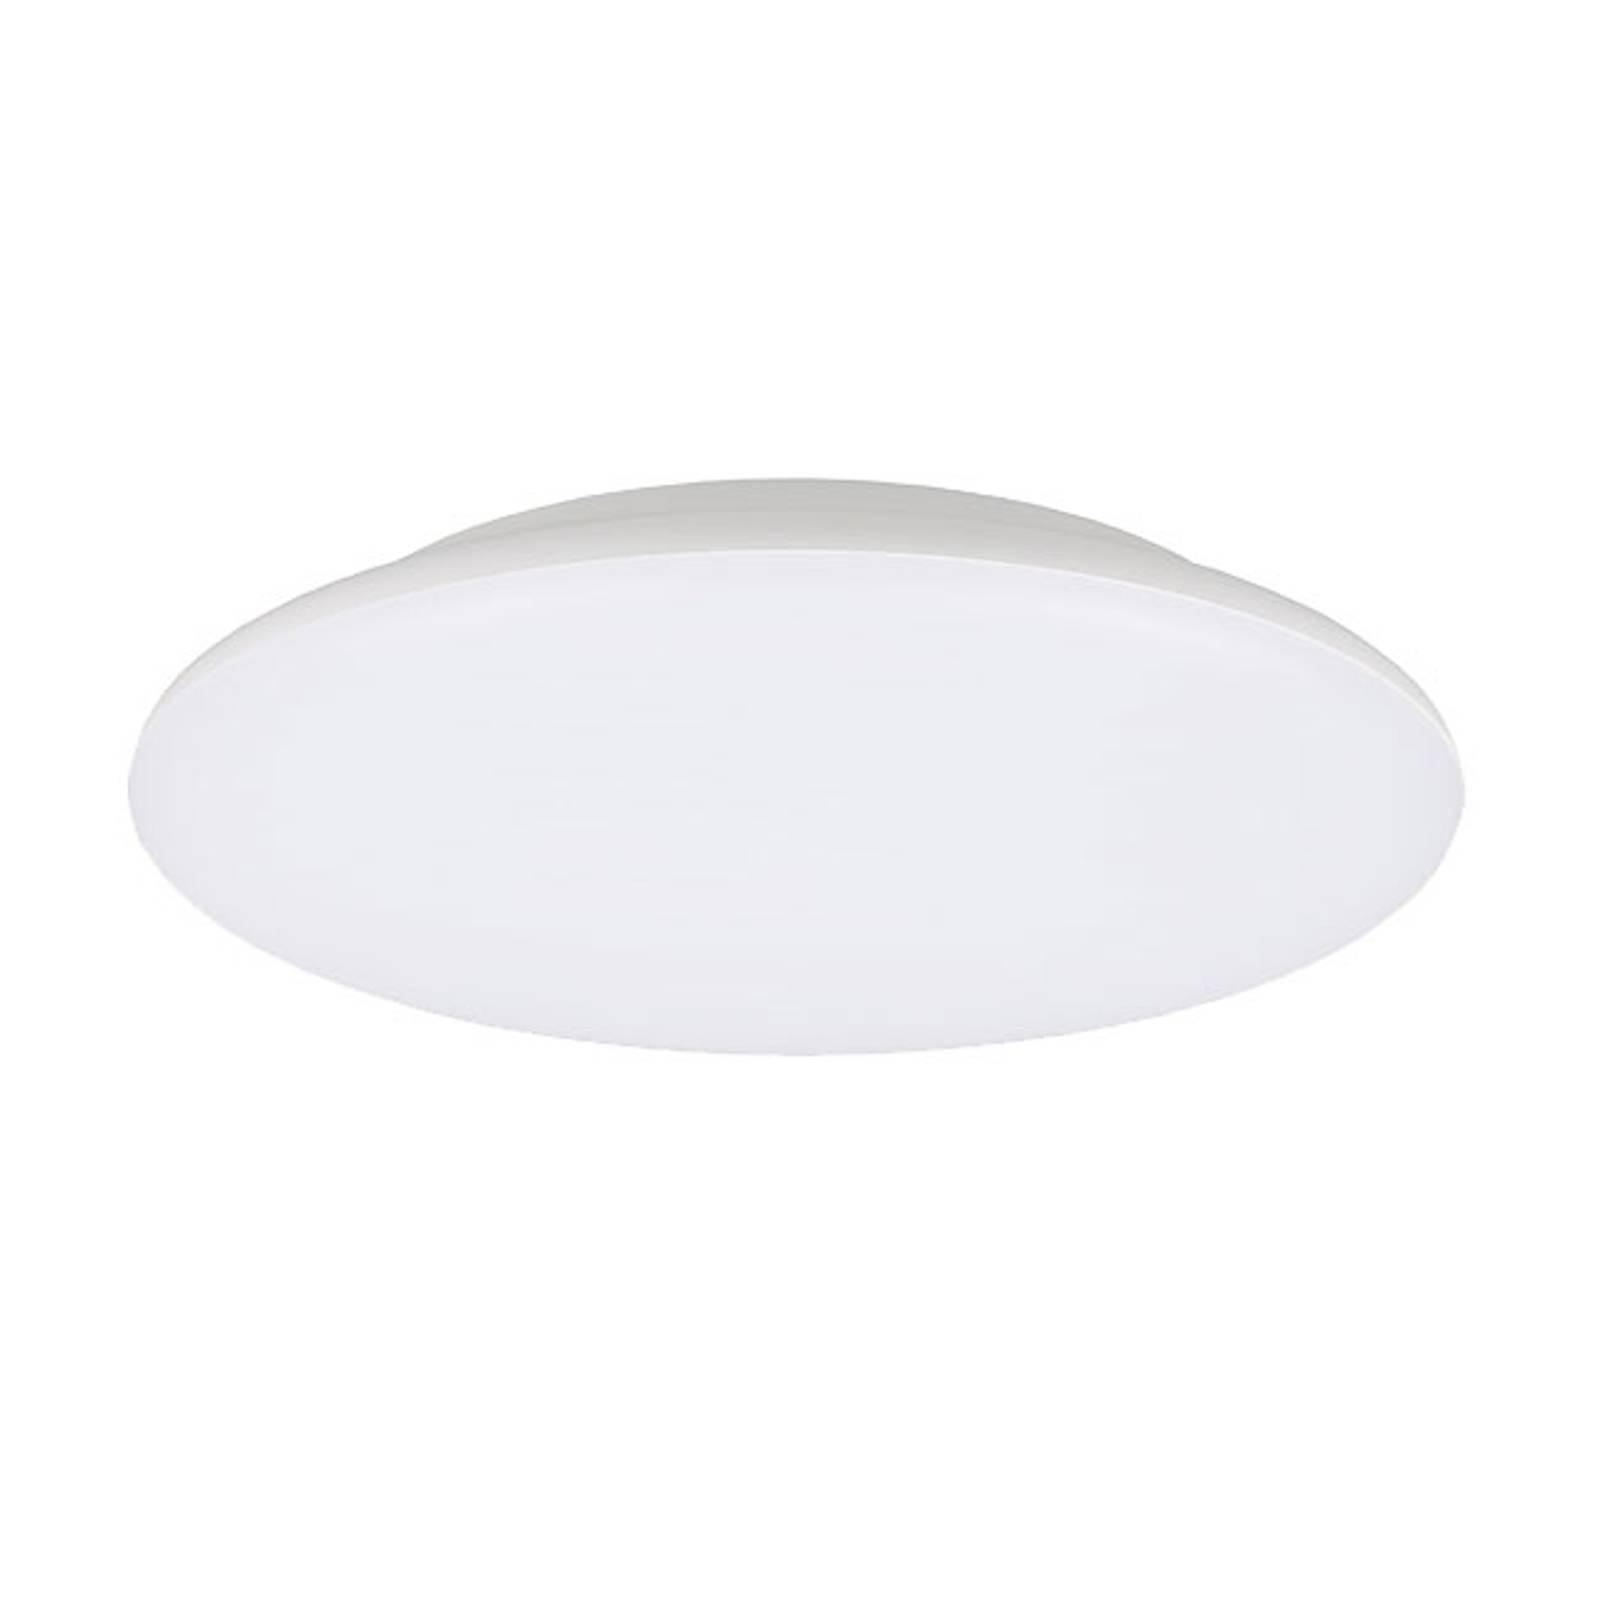 Arcchio Samory LED-Deckenleuchte, Ø 30 cm